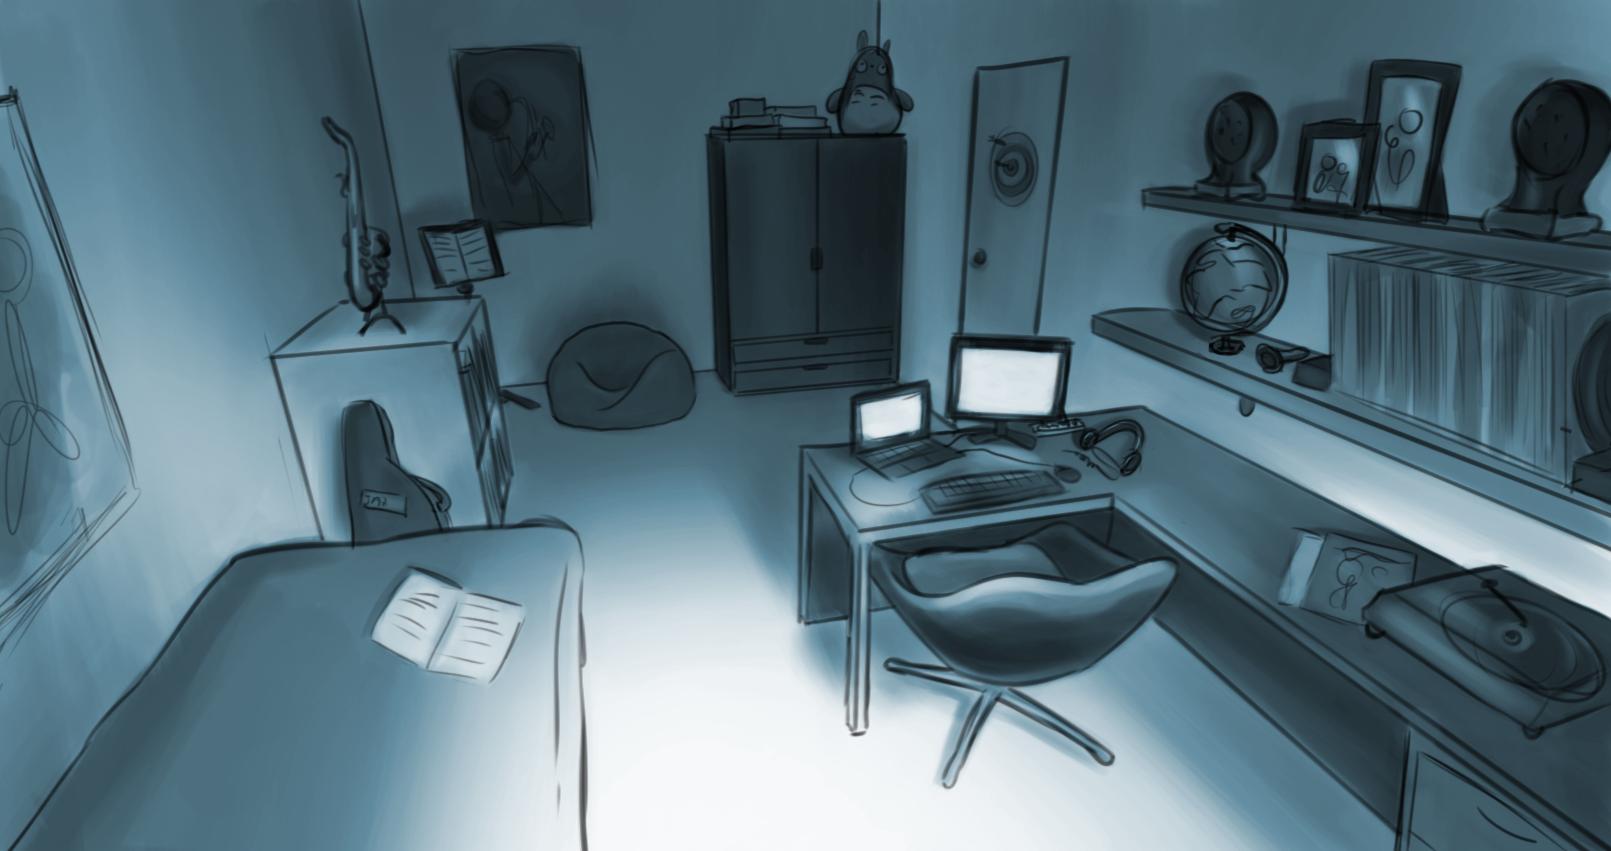 justin's room